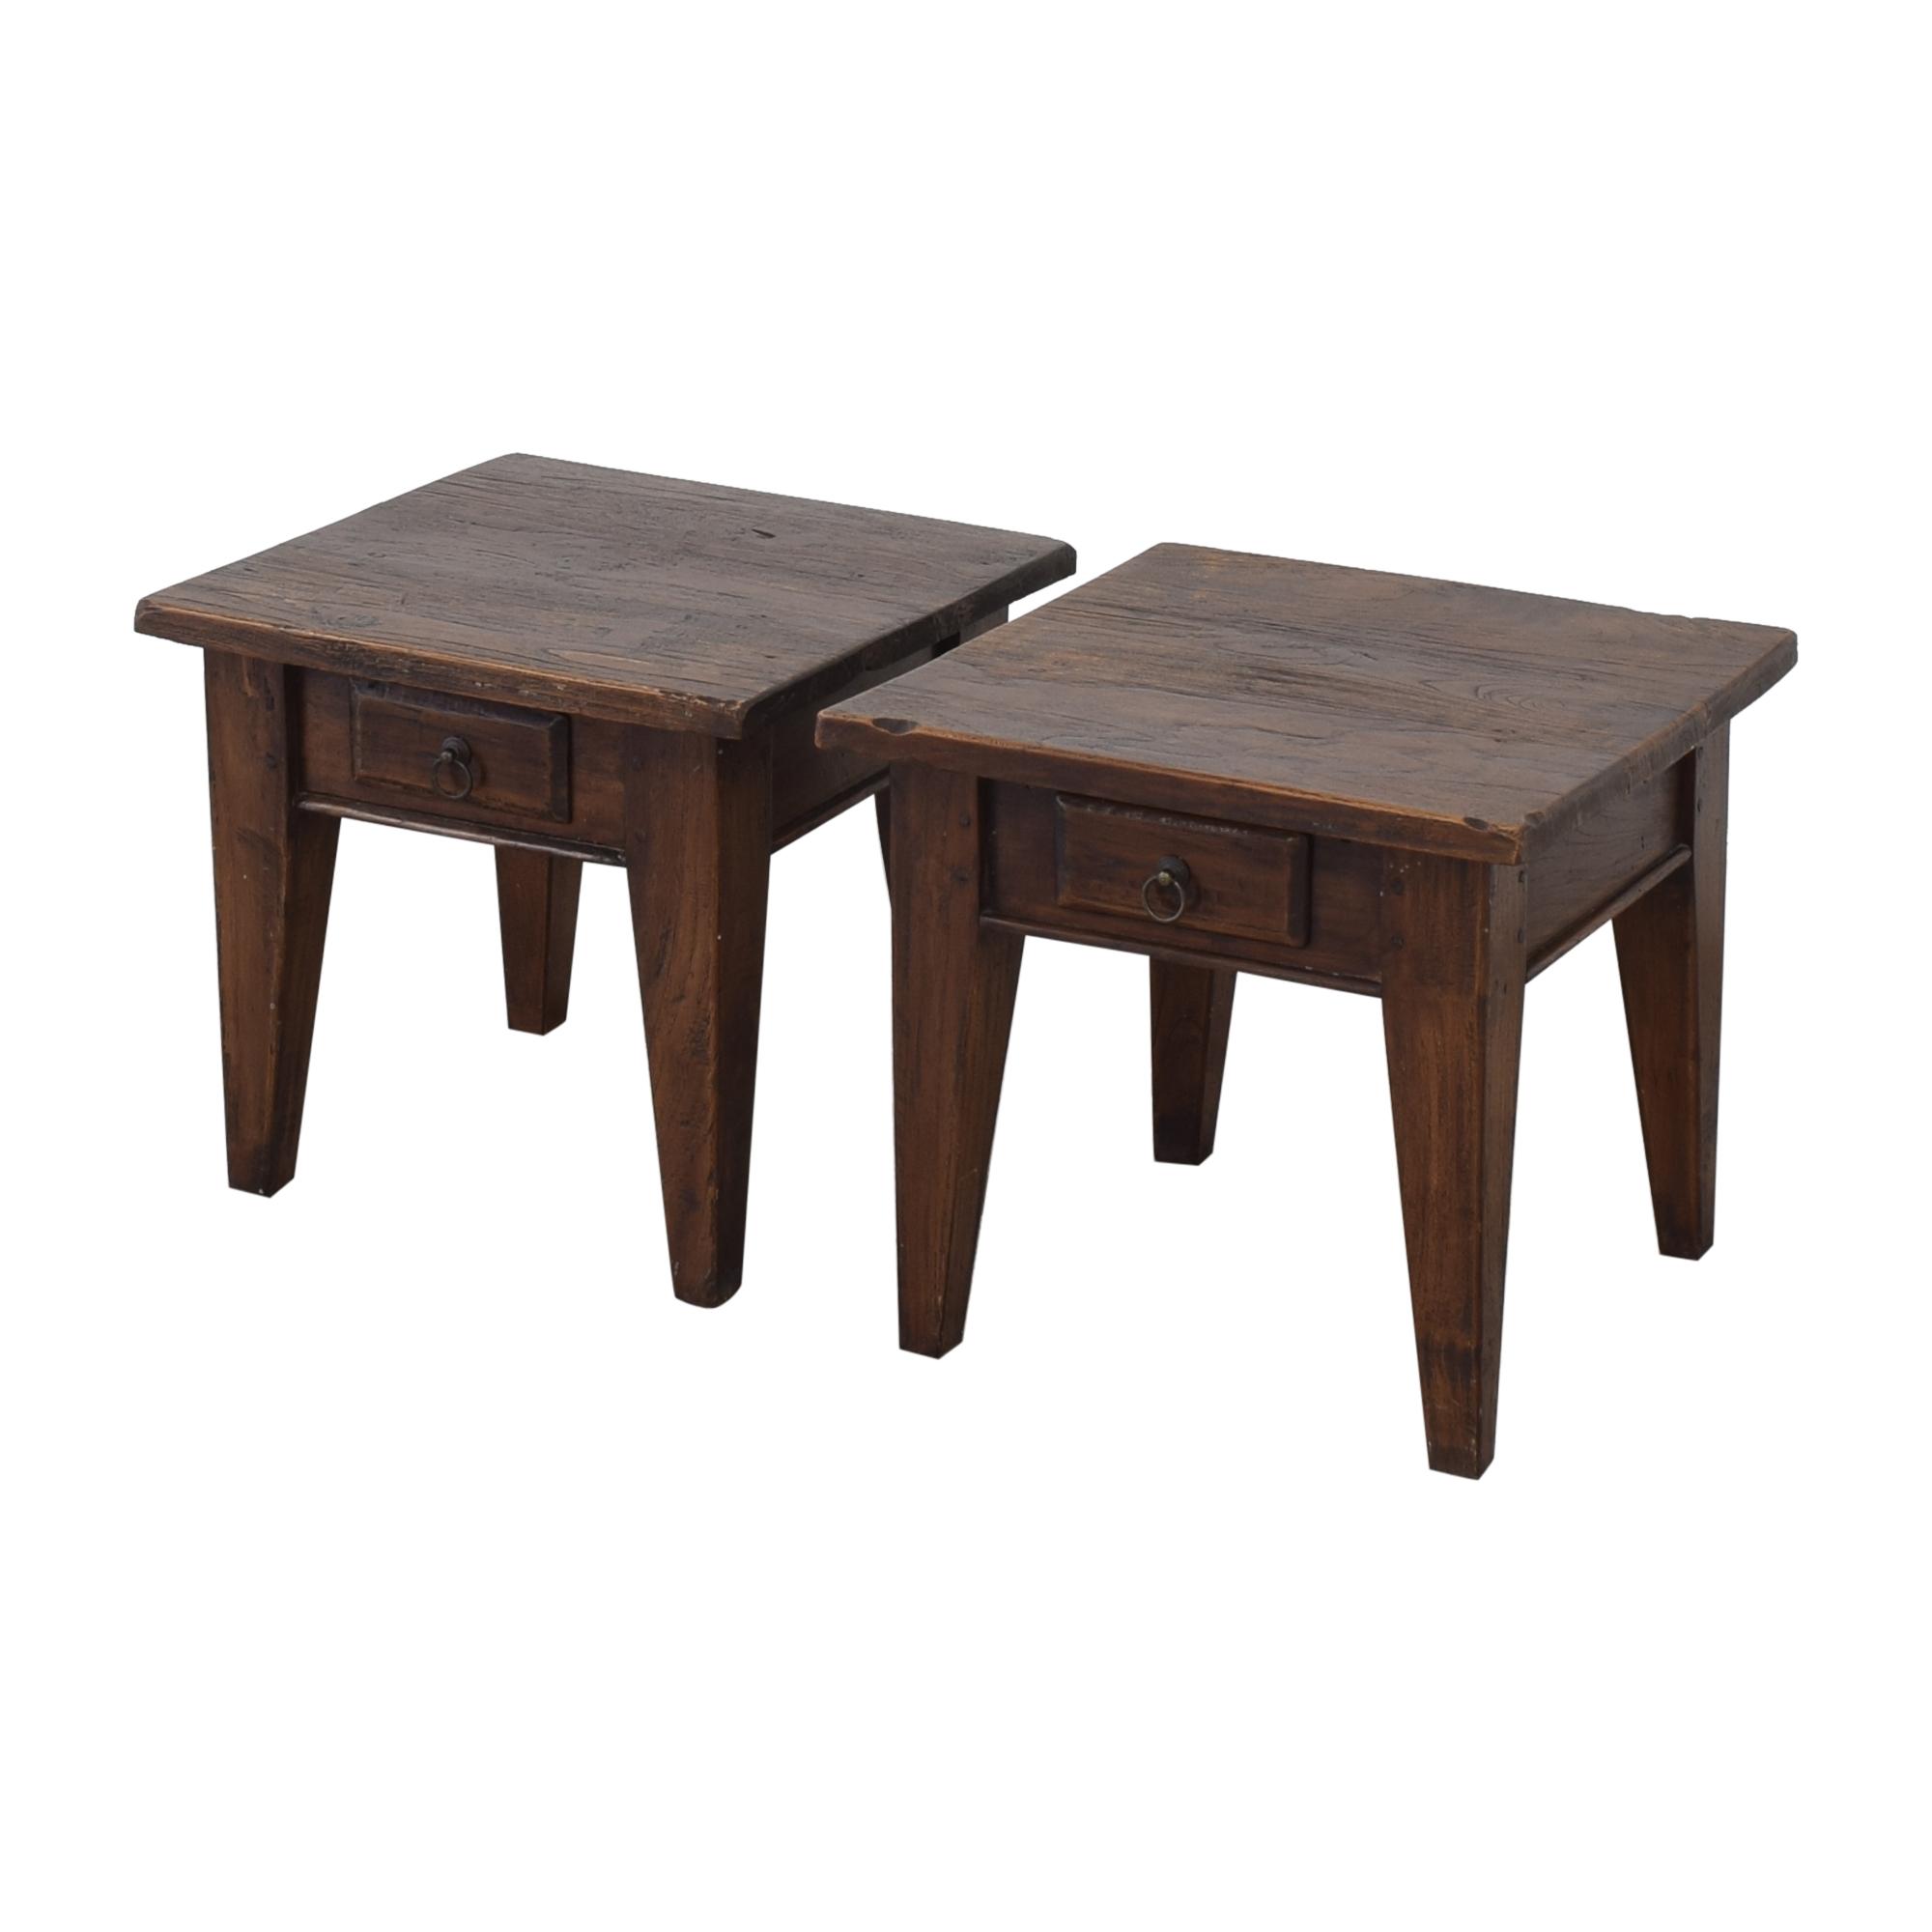 buy Lillian August Lillian August End Tables online